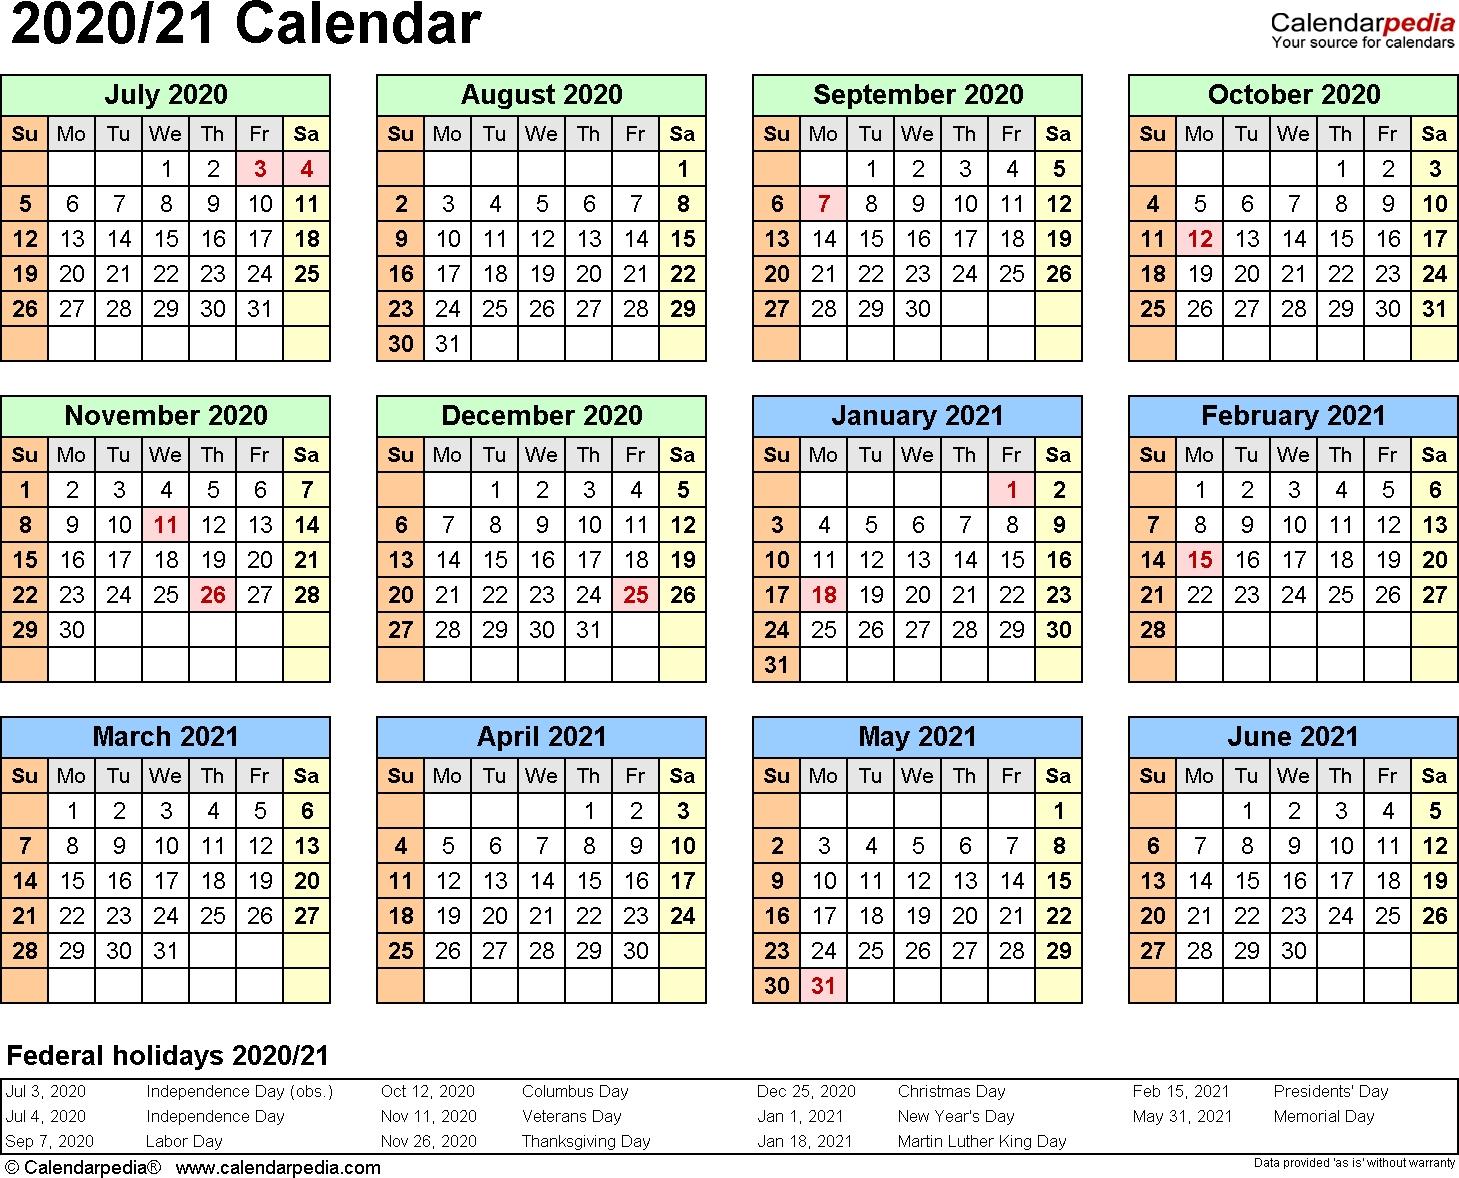 Split Year Calendar 2020/21 (July To June) - Word Templates-Microsoft Calendar Templates 2020